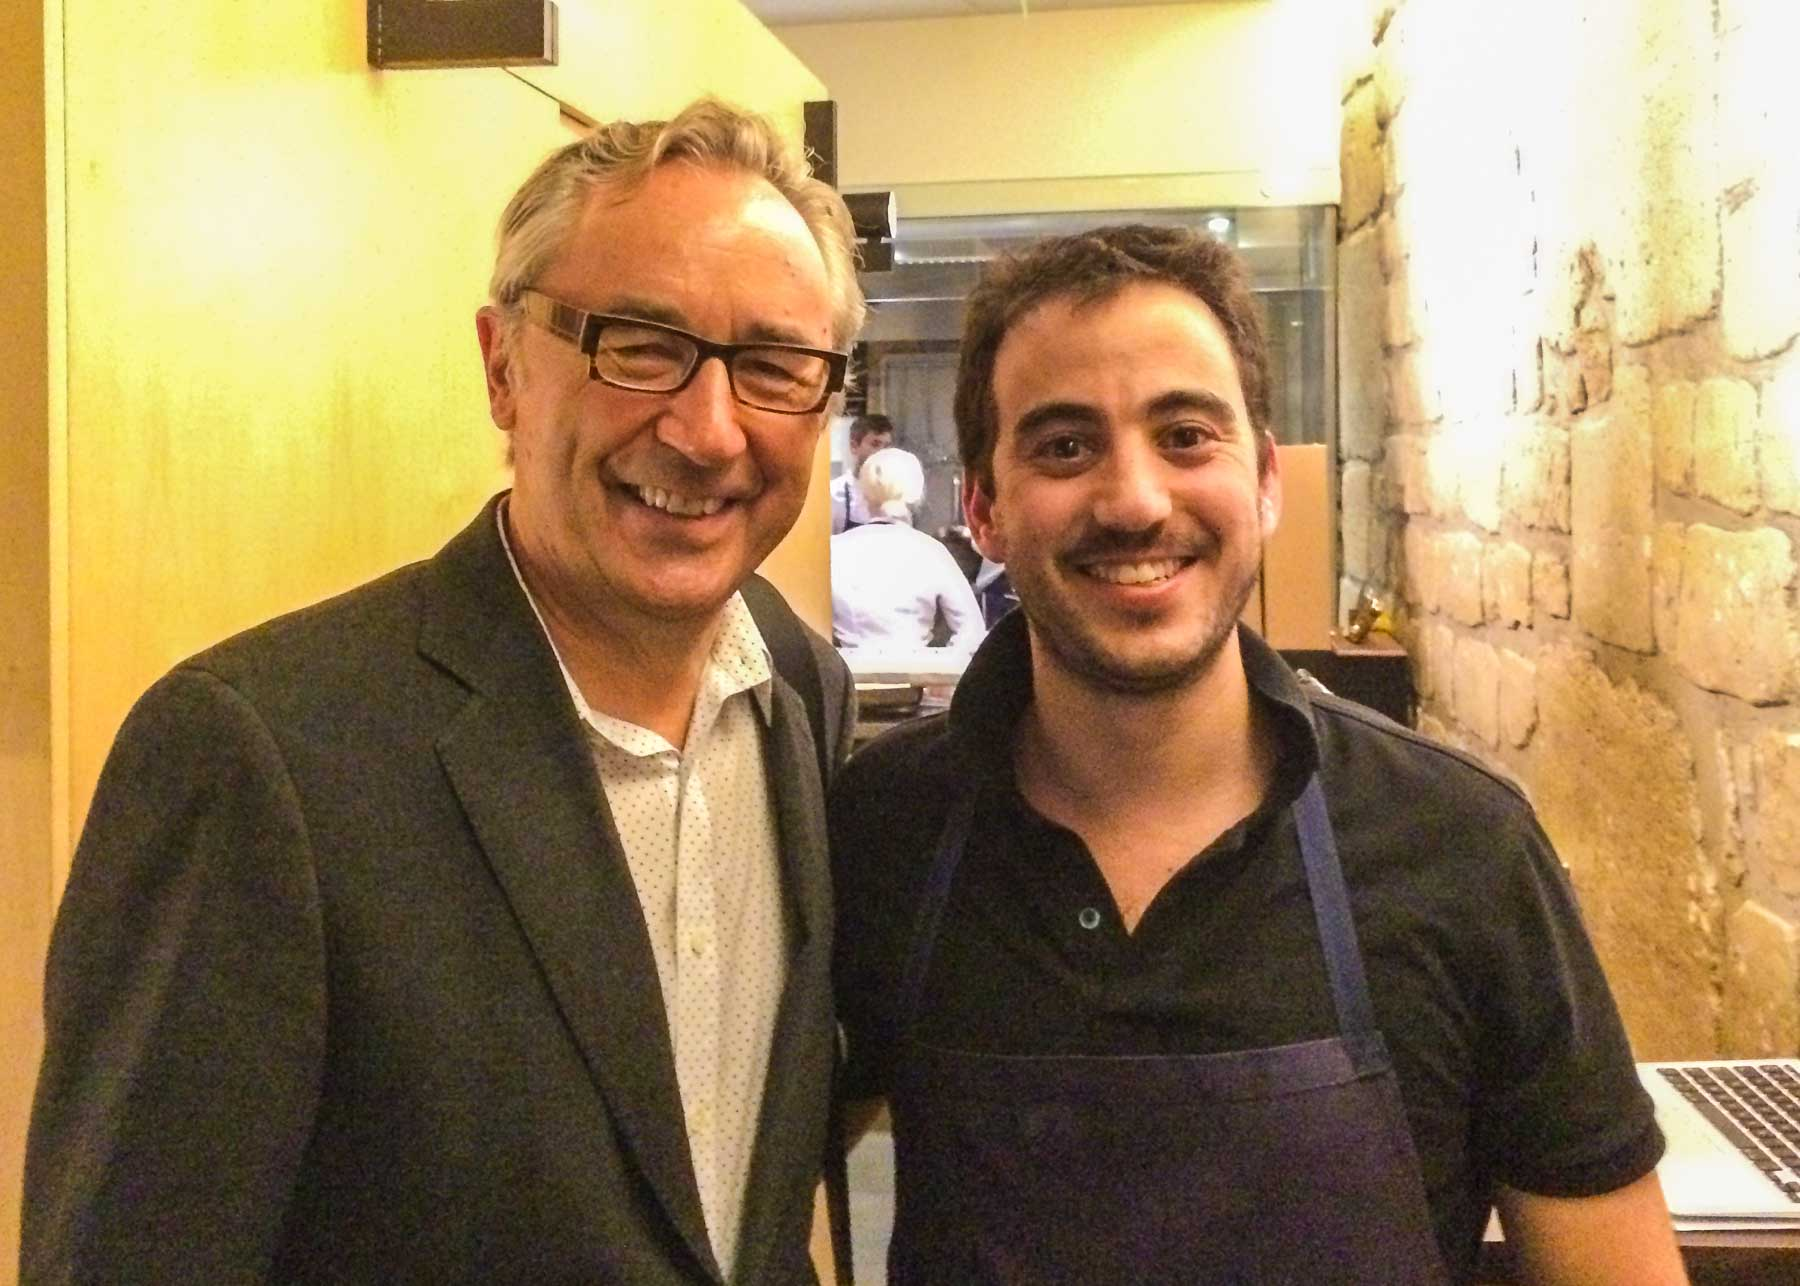 With Daniel Rose of Spring restaurant.